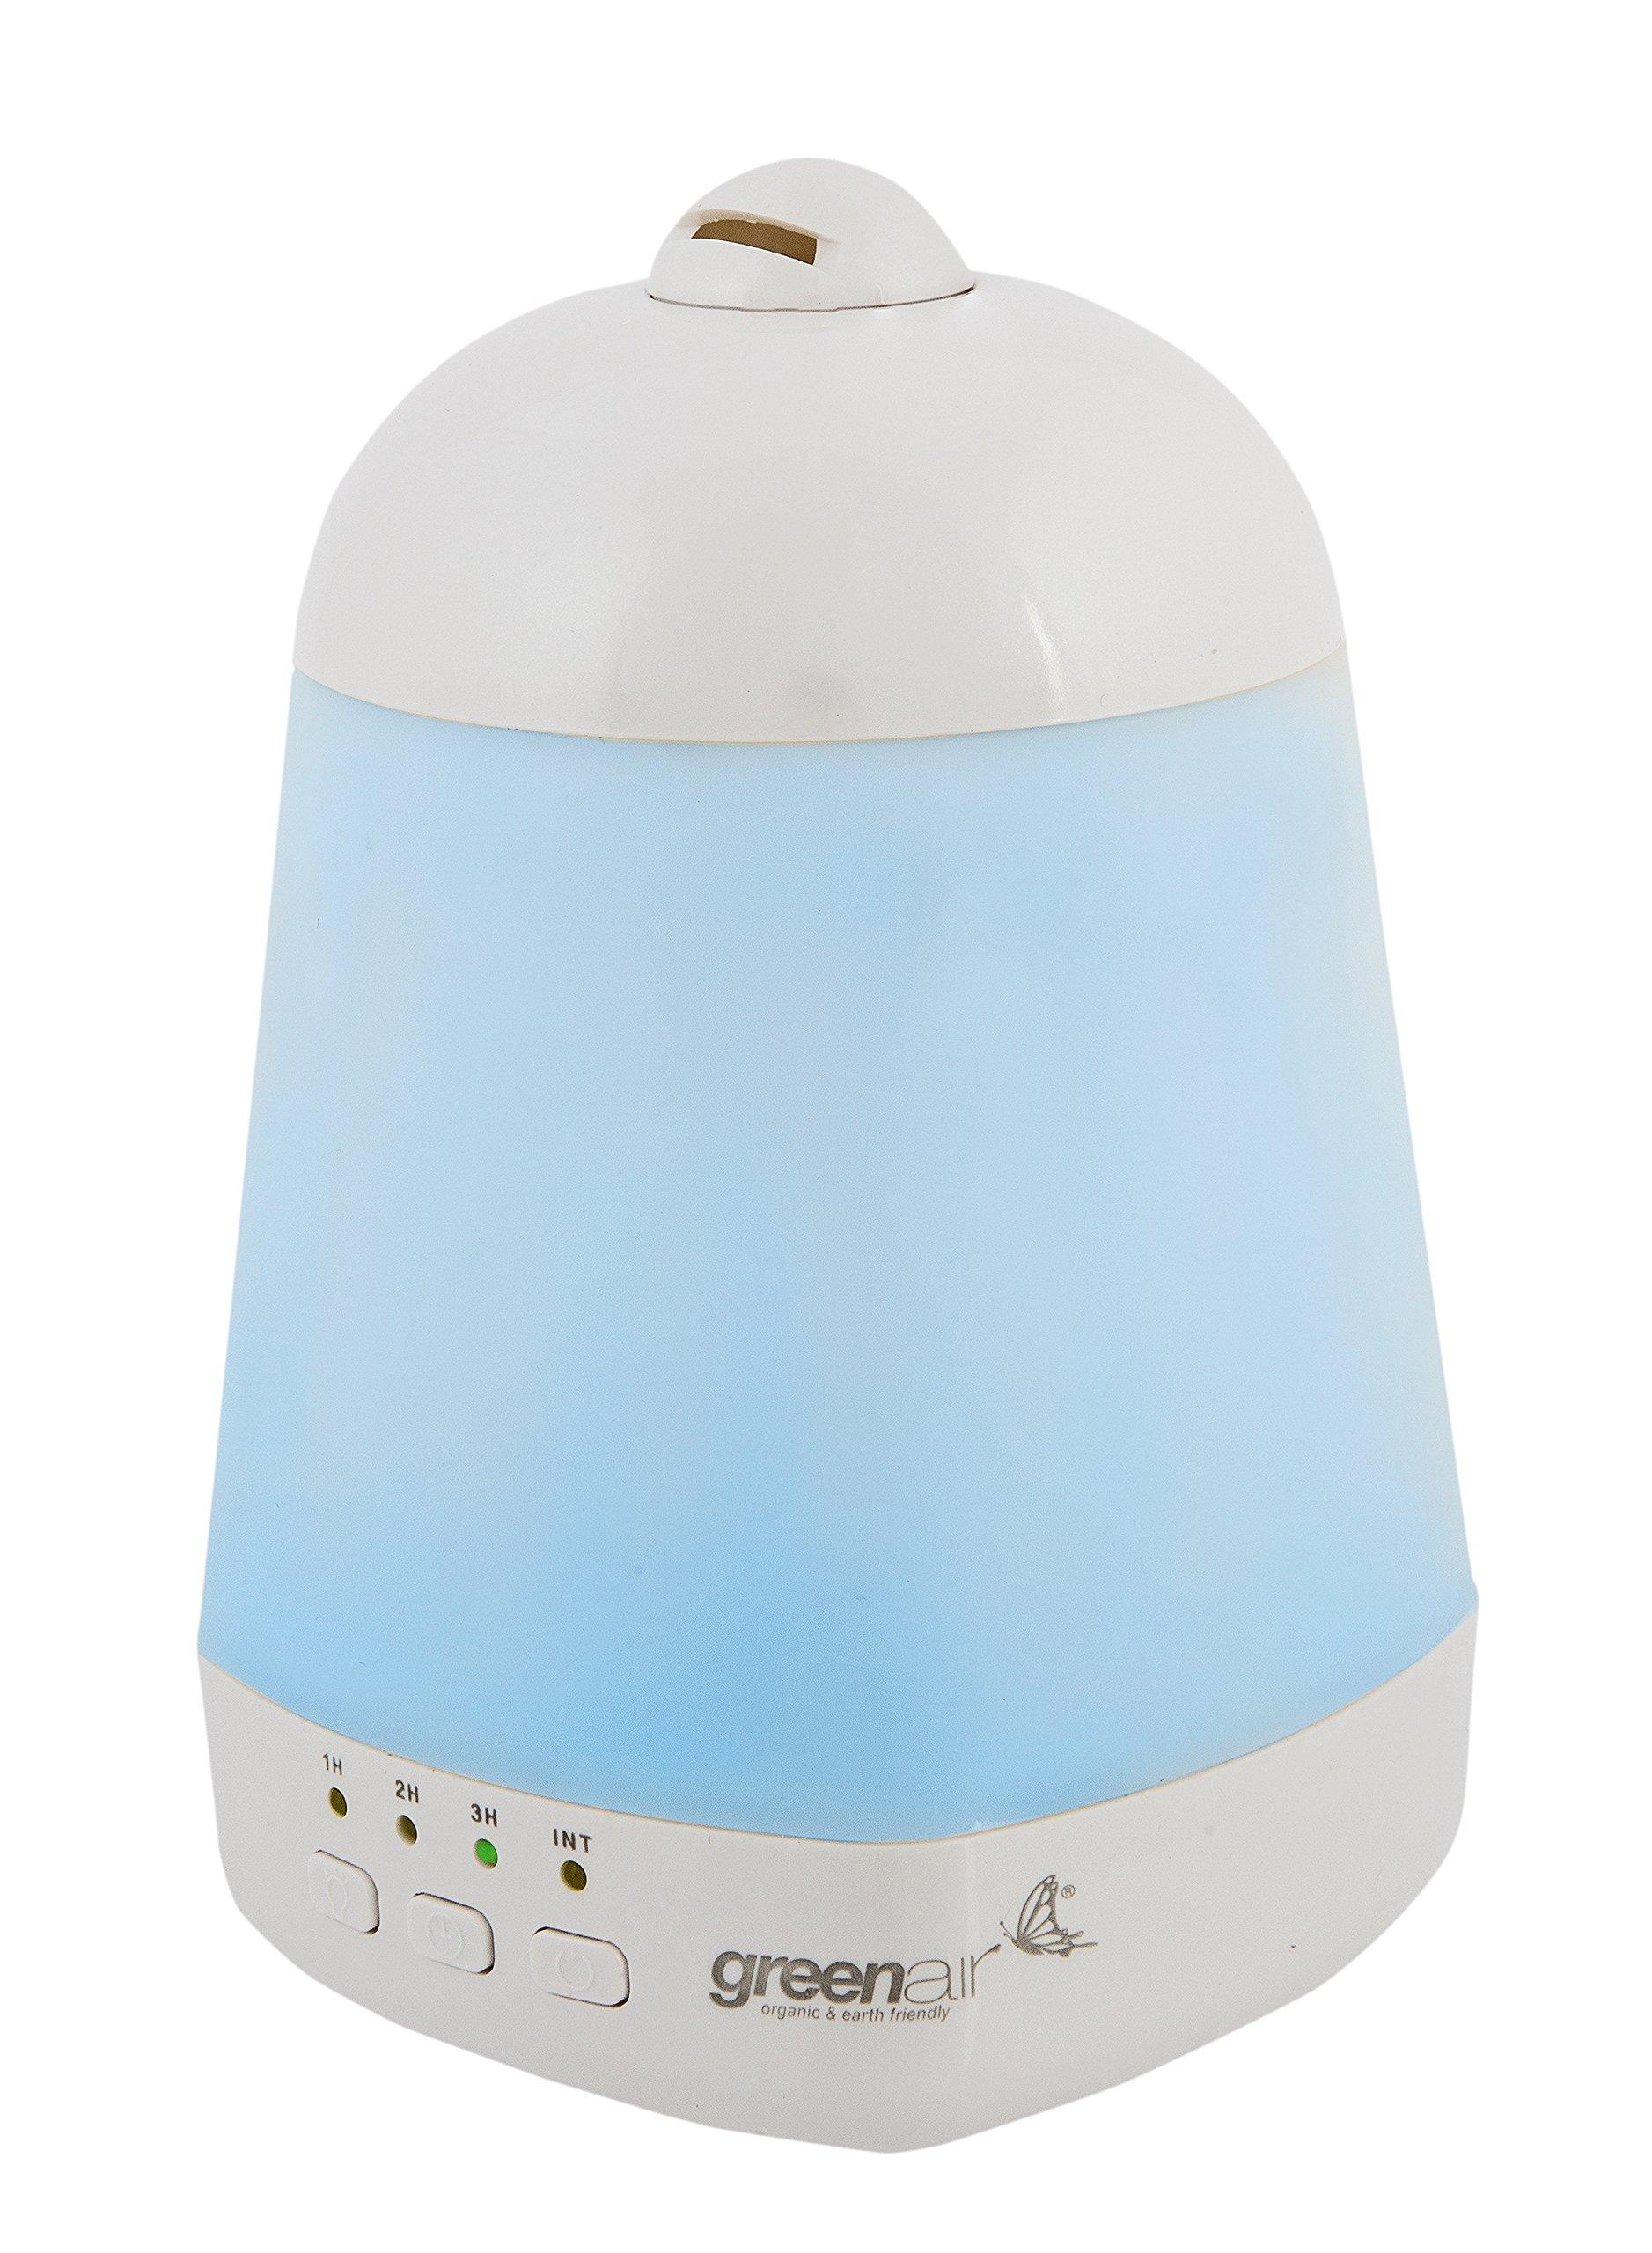 Amazon.com: GreenAir AromaMister Ultrasonic Essential Oil